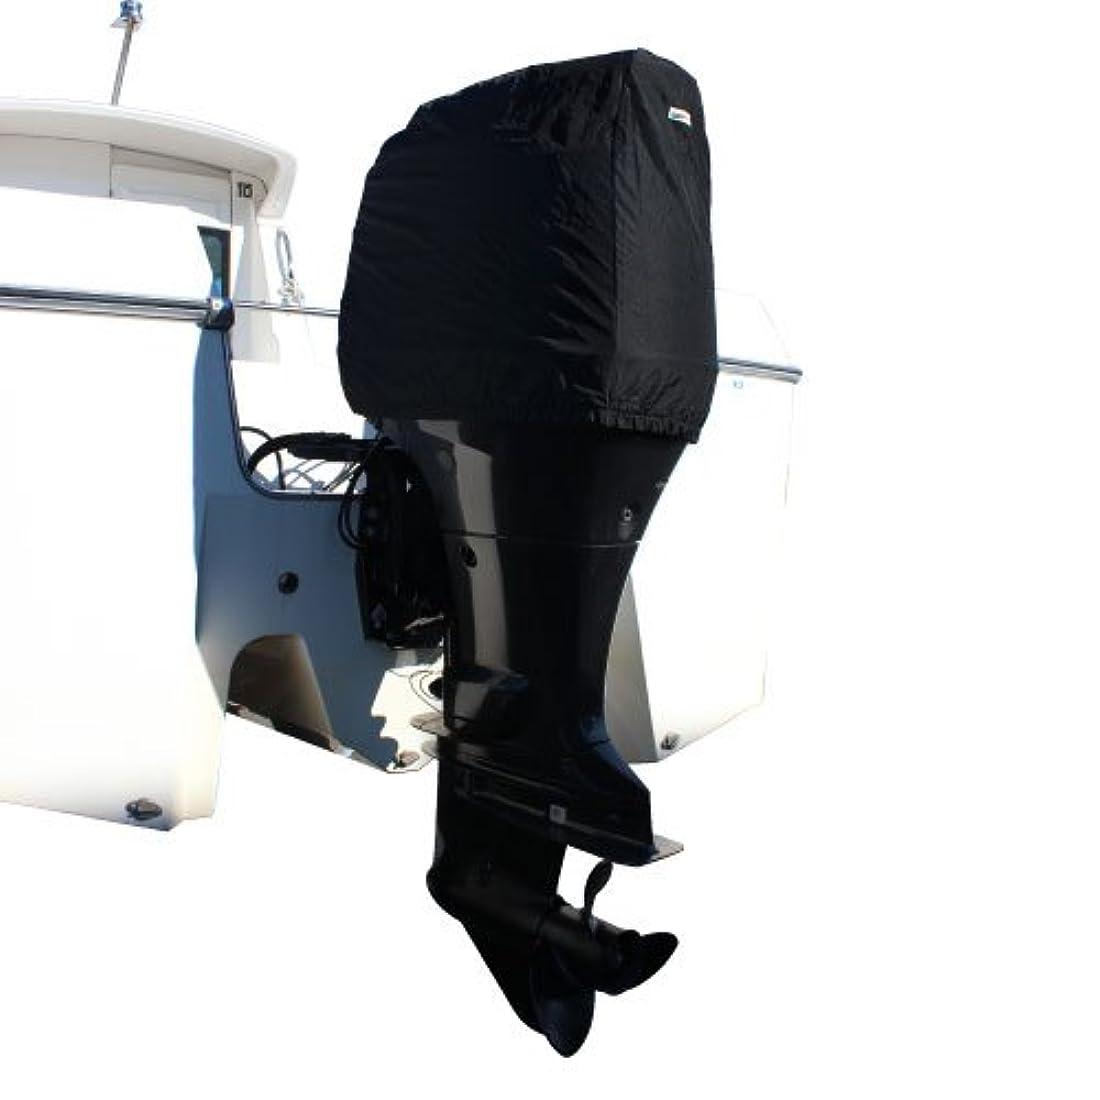 BMO JAPAN(ビーエムオージャパン) 船外機カバー SUZUKI専用(S10-S) 50B0029